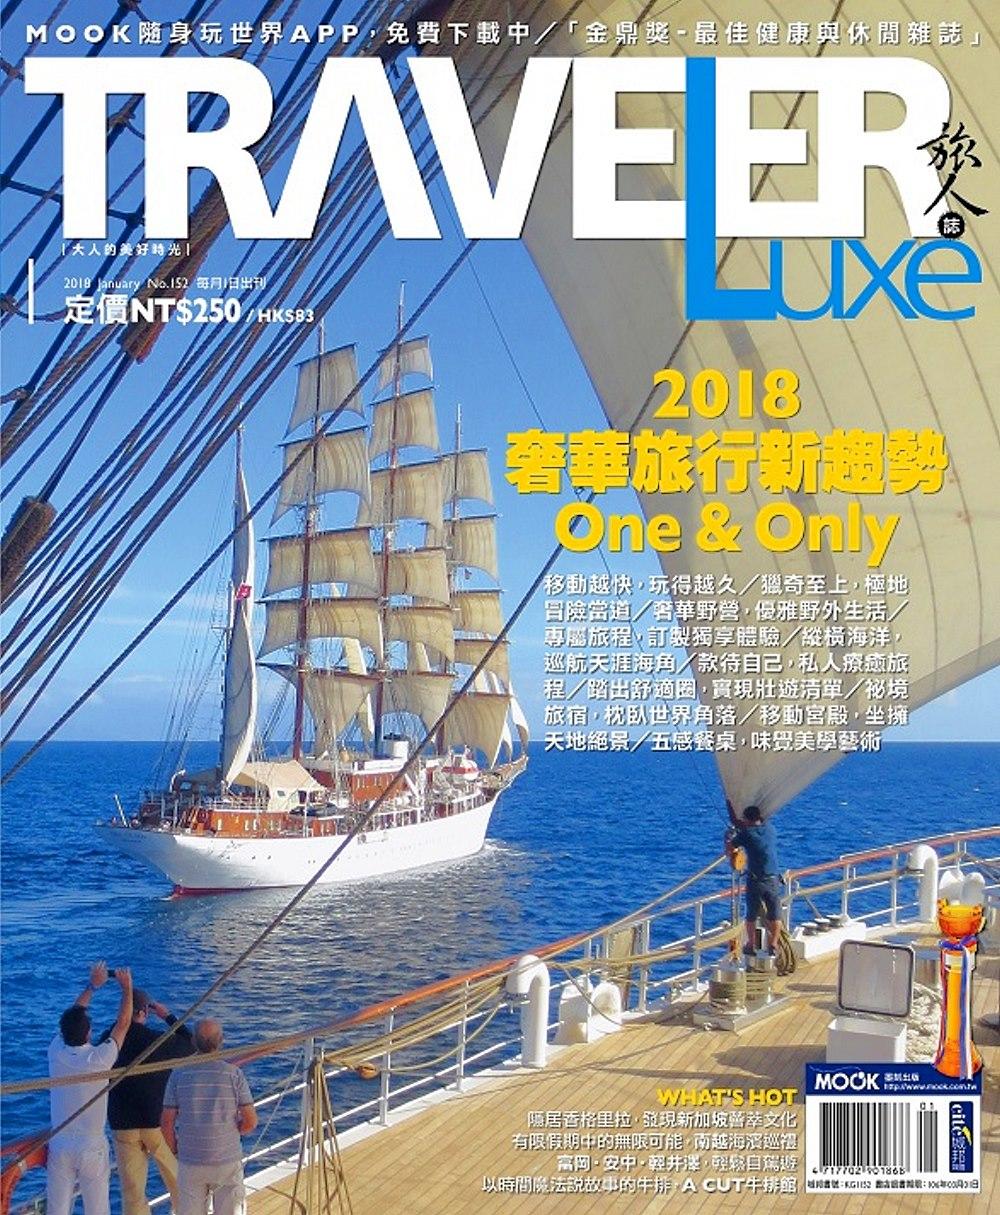 TRAVELER LUXE 旅人誌 1月號/2018 第152期+【anello日本銷售量NO.1】旅遊側背包 - 深藍色款